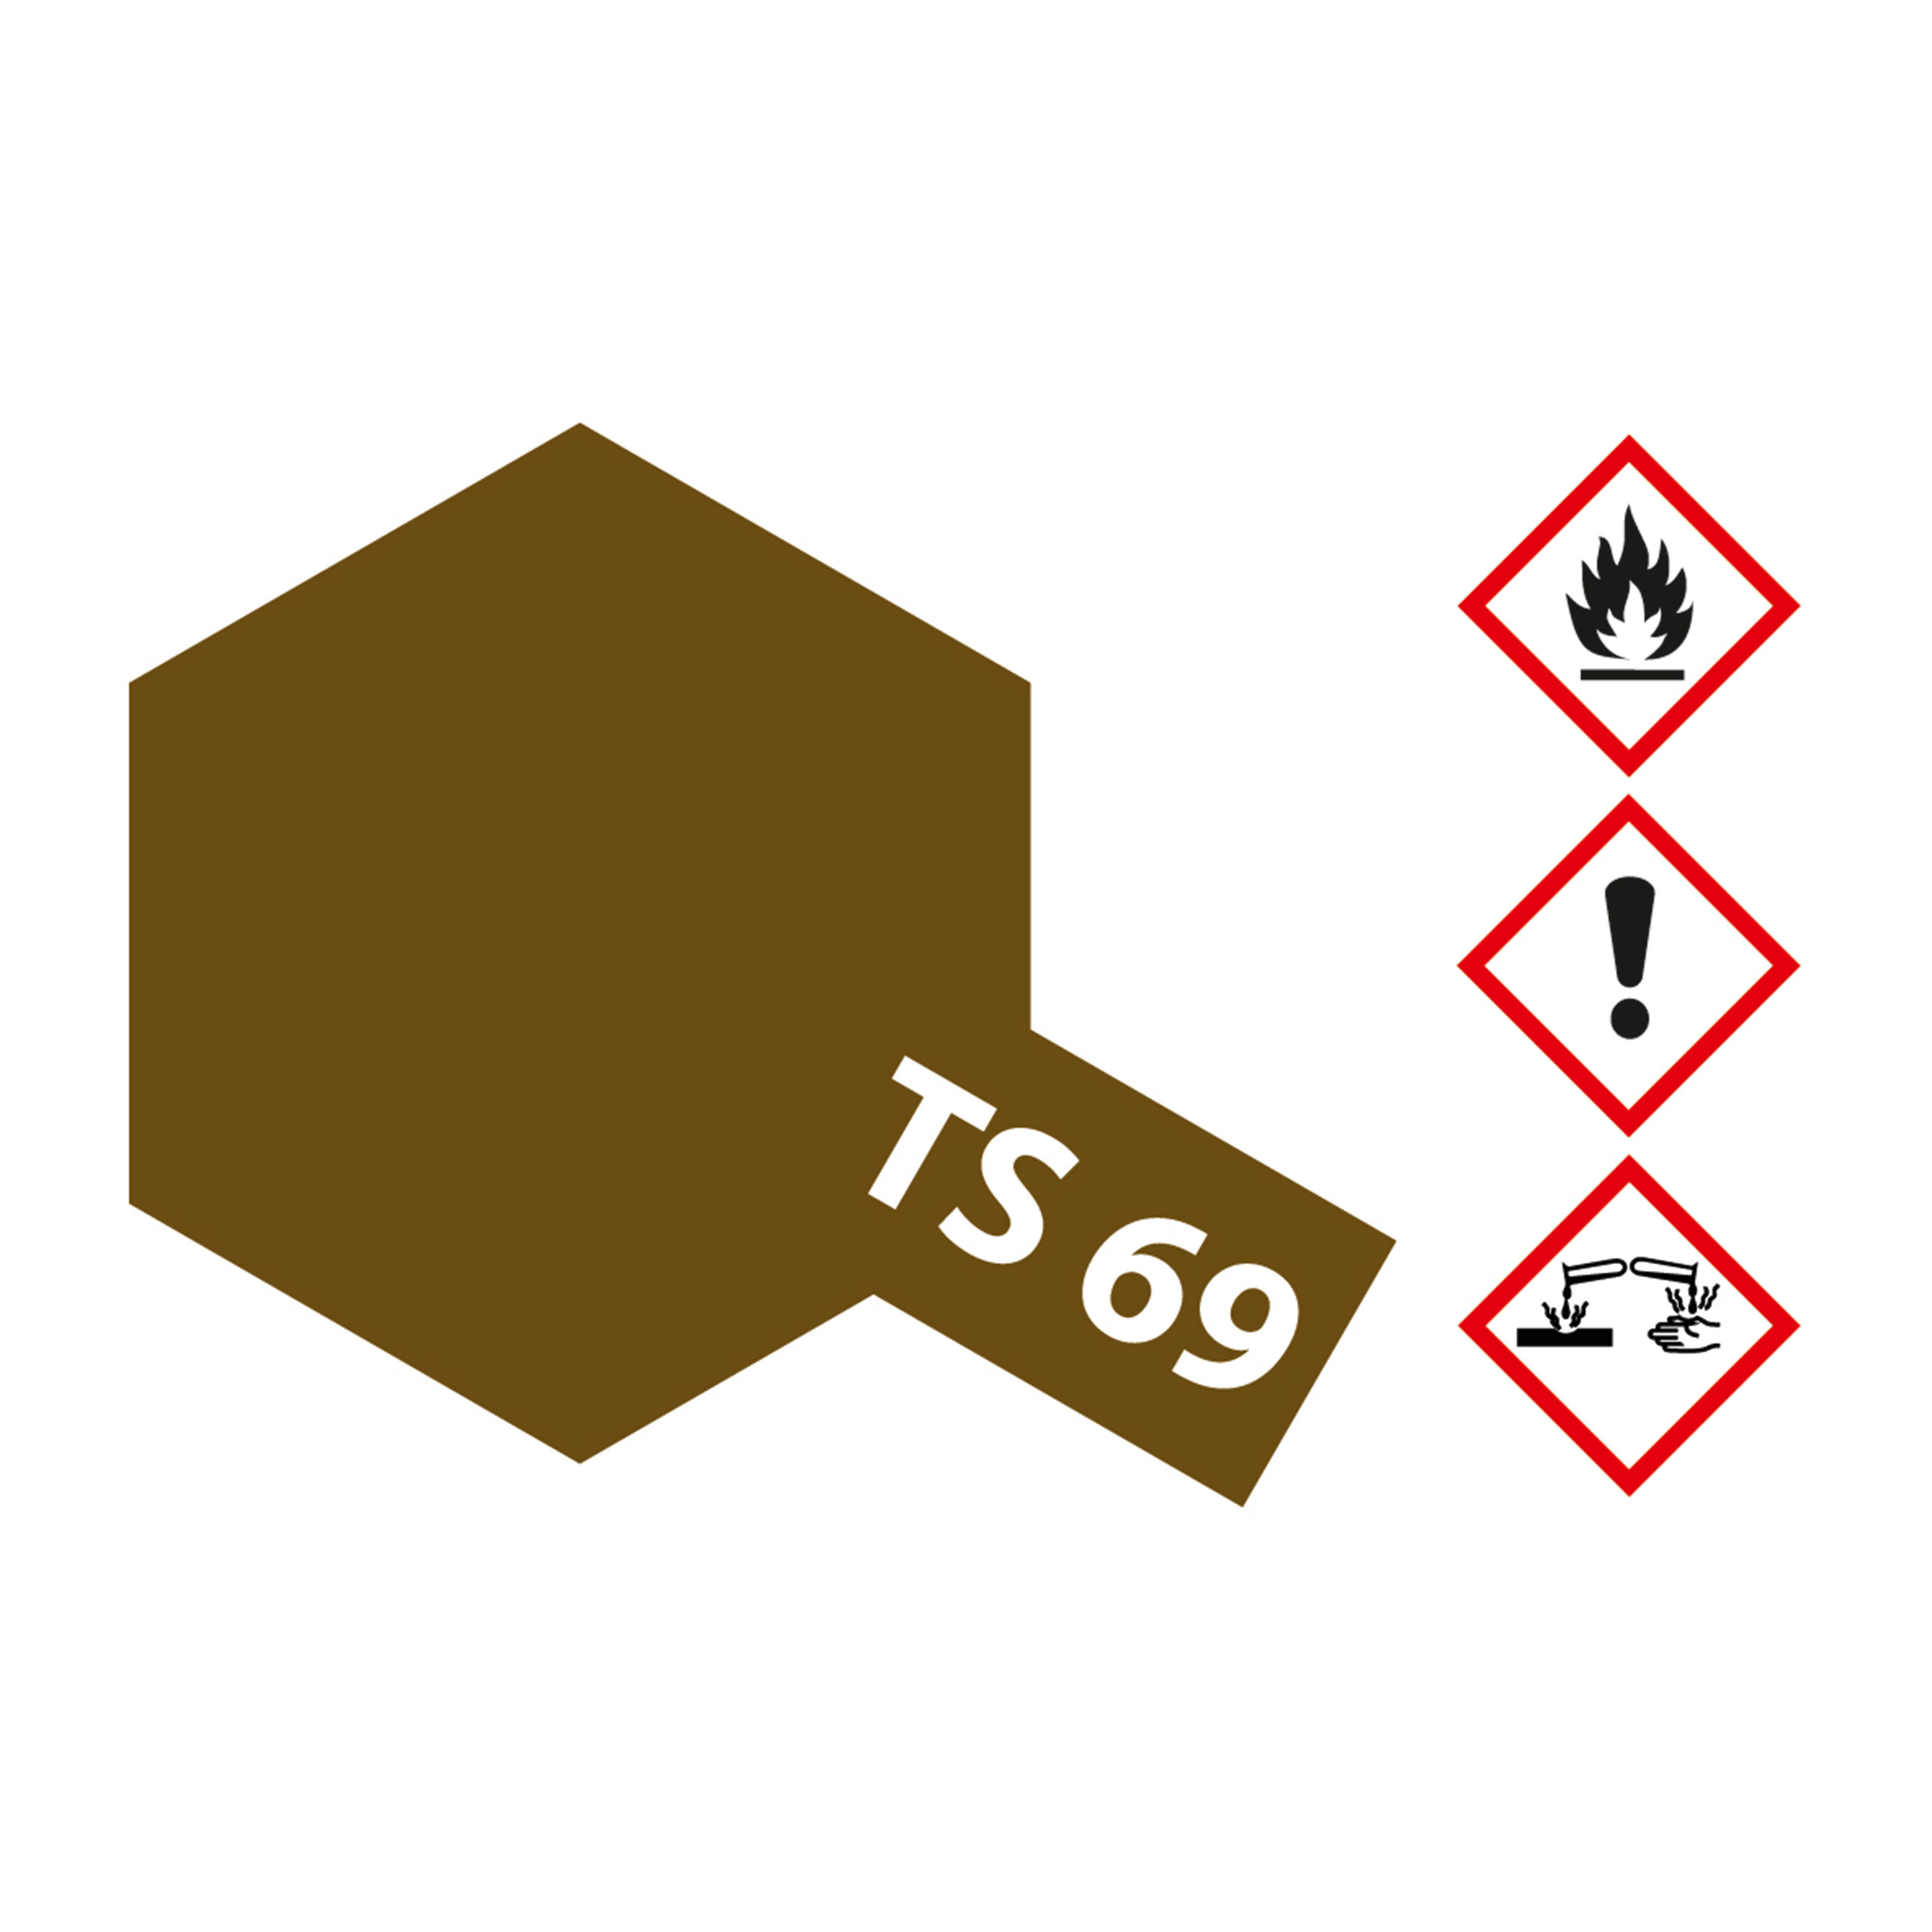 TS-69 Linoleum Deck Braun matt - 100ml Sprayfarbe Kunstharz Tamiya 300085069